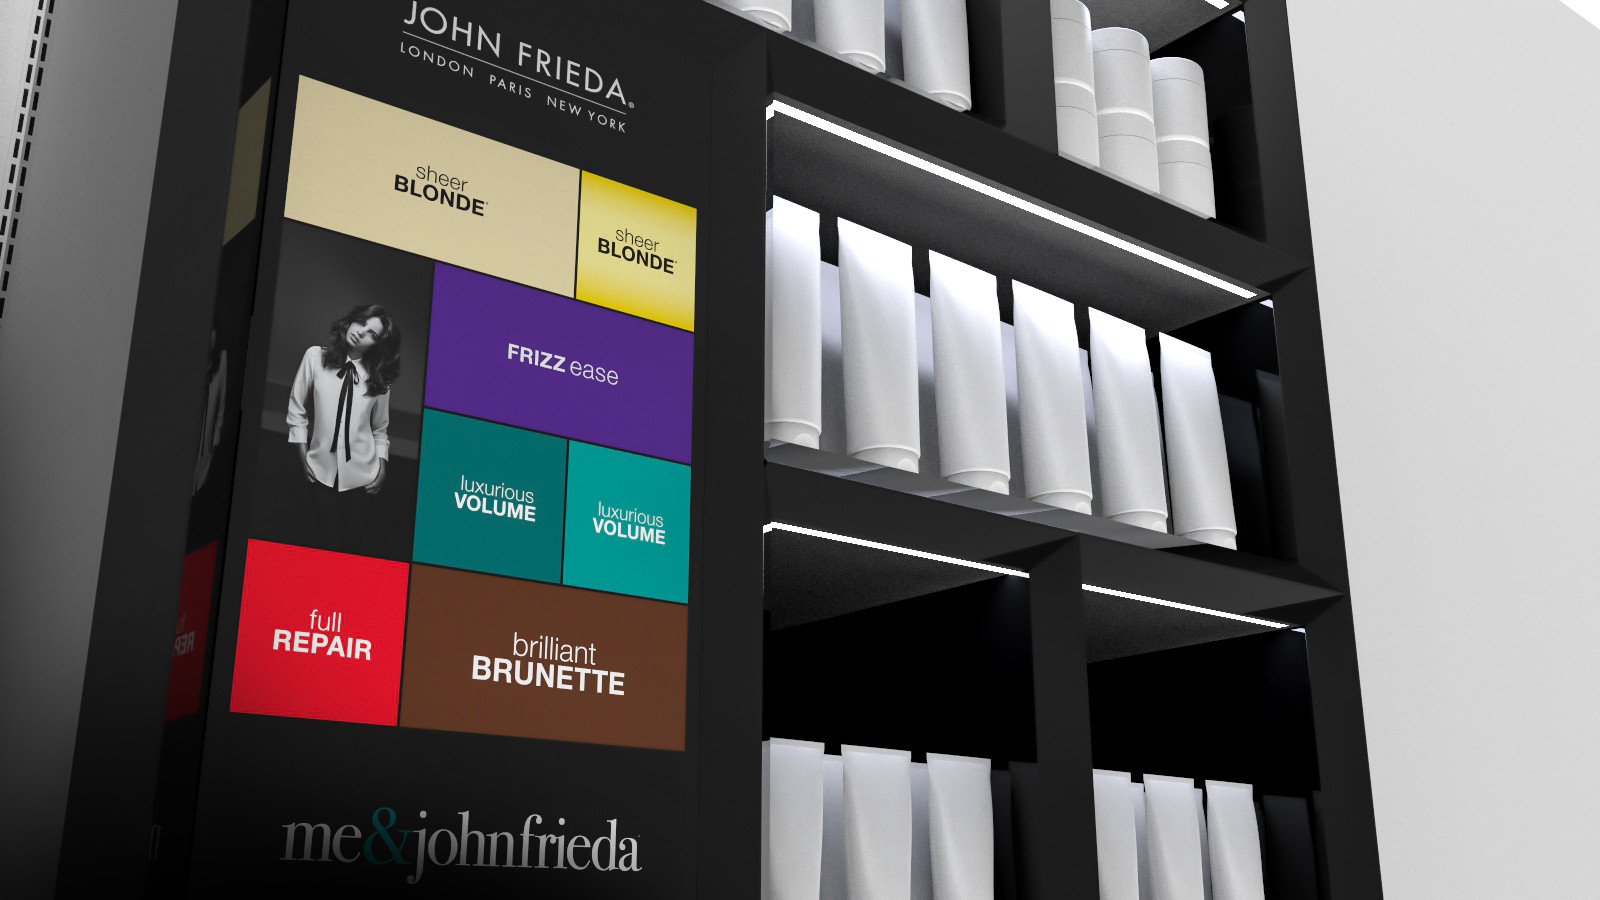 John Frieda 2nd placement 3.jpg